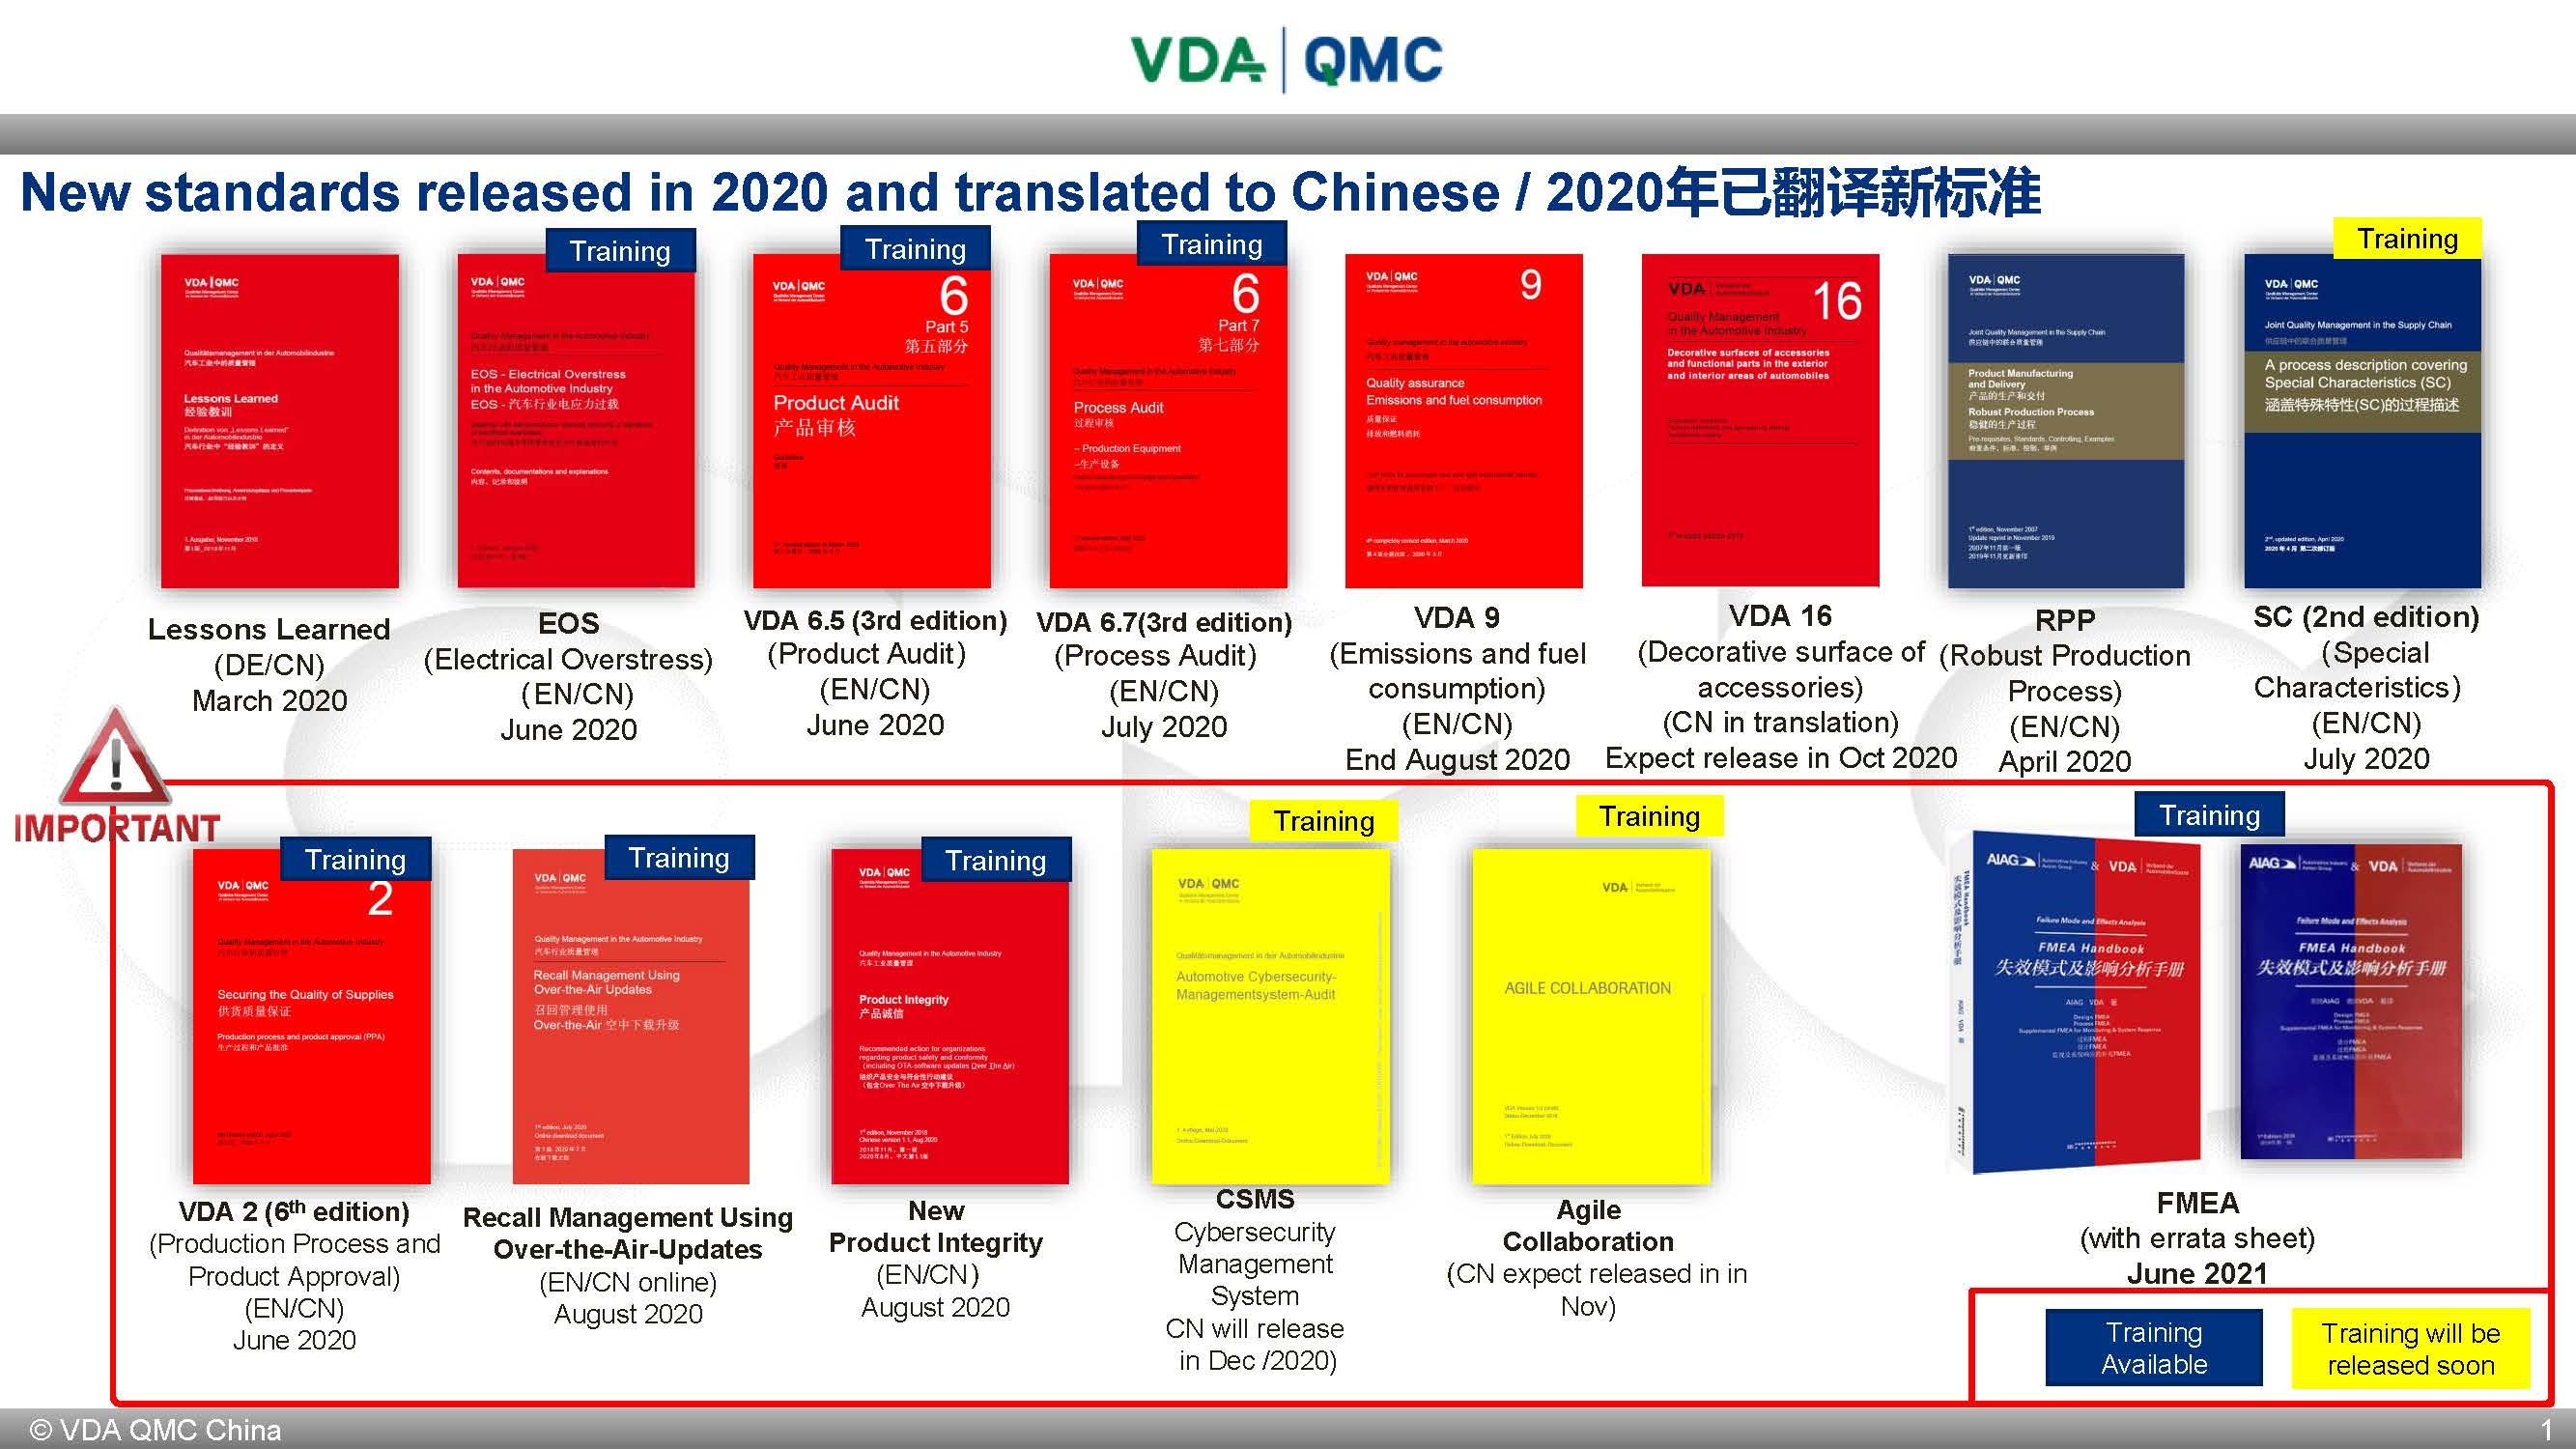 20201015_VDA-QMC-China-LPC_meeting_final-final_TT-GB.jpg